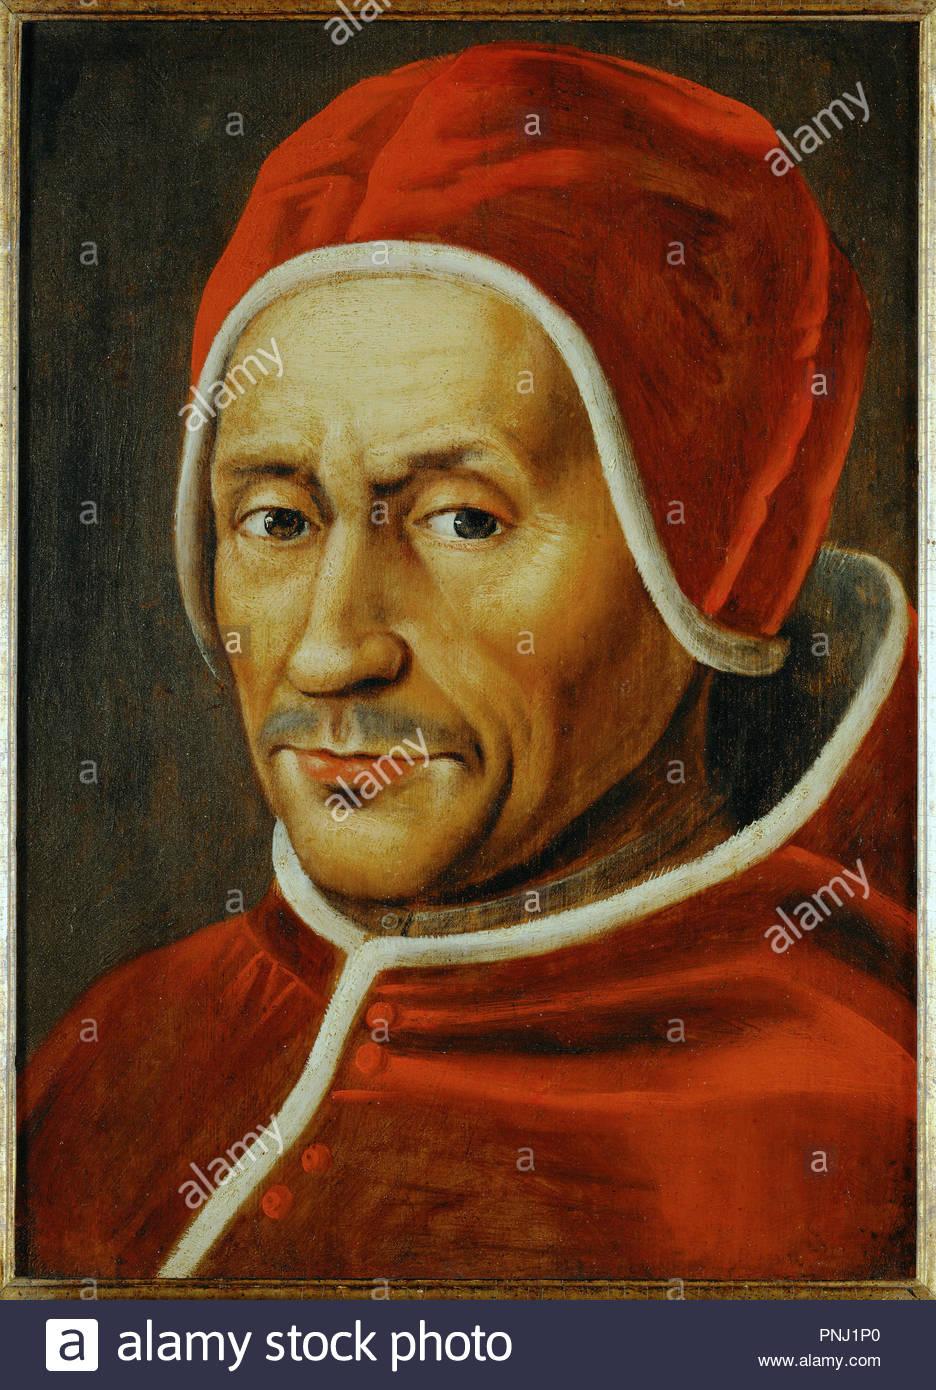 Pope Hadrian VI (Adrian Florisz,1459-1523). Copy after Jan van Scorel.  Wood,89,5 x 69,5 cm. Author: SCOREL, JAN VAN. Location: Katholieke  Universitaet